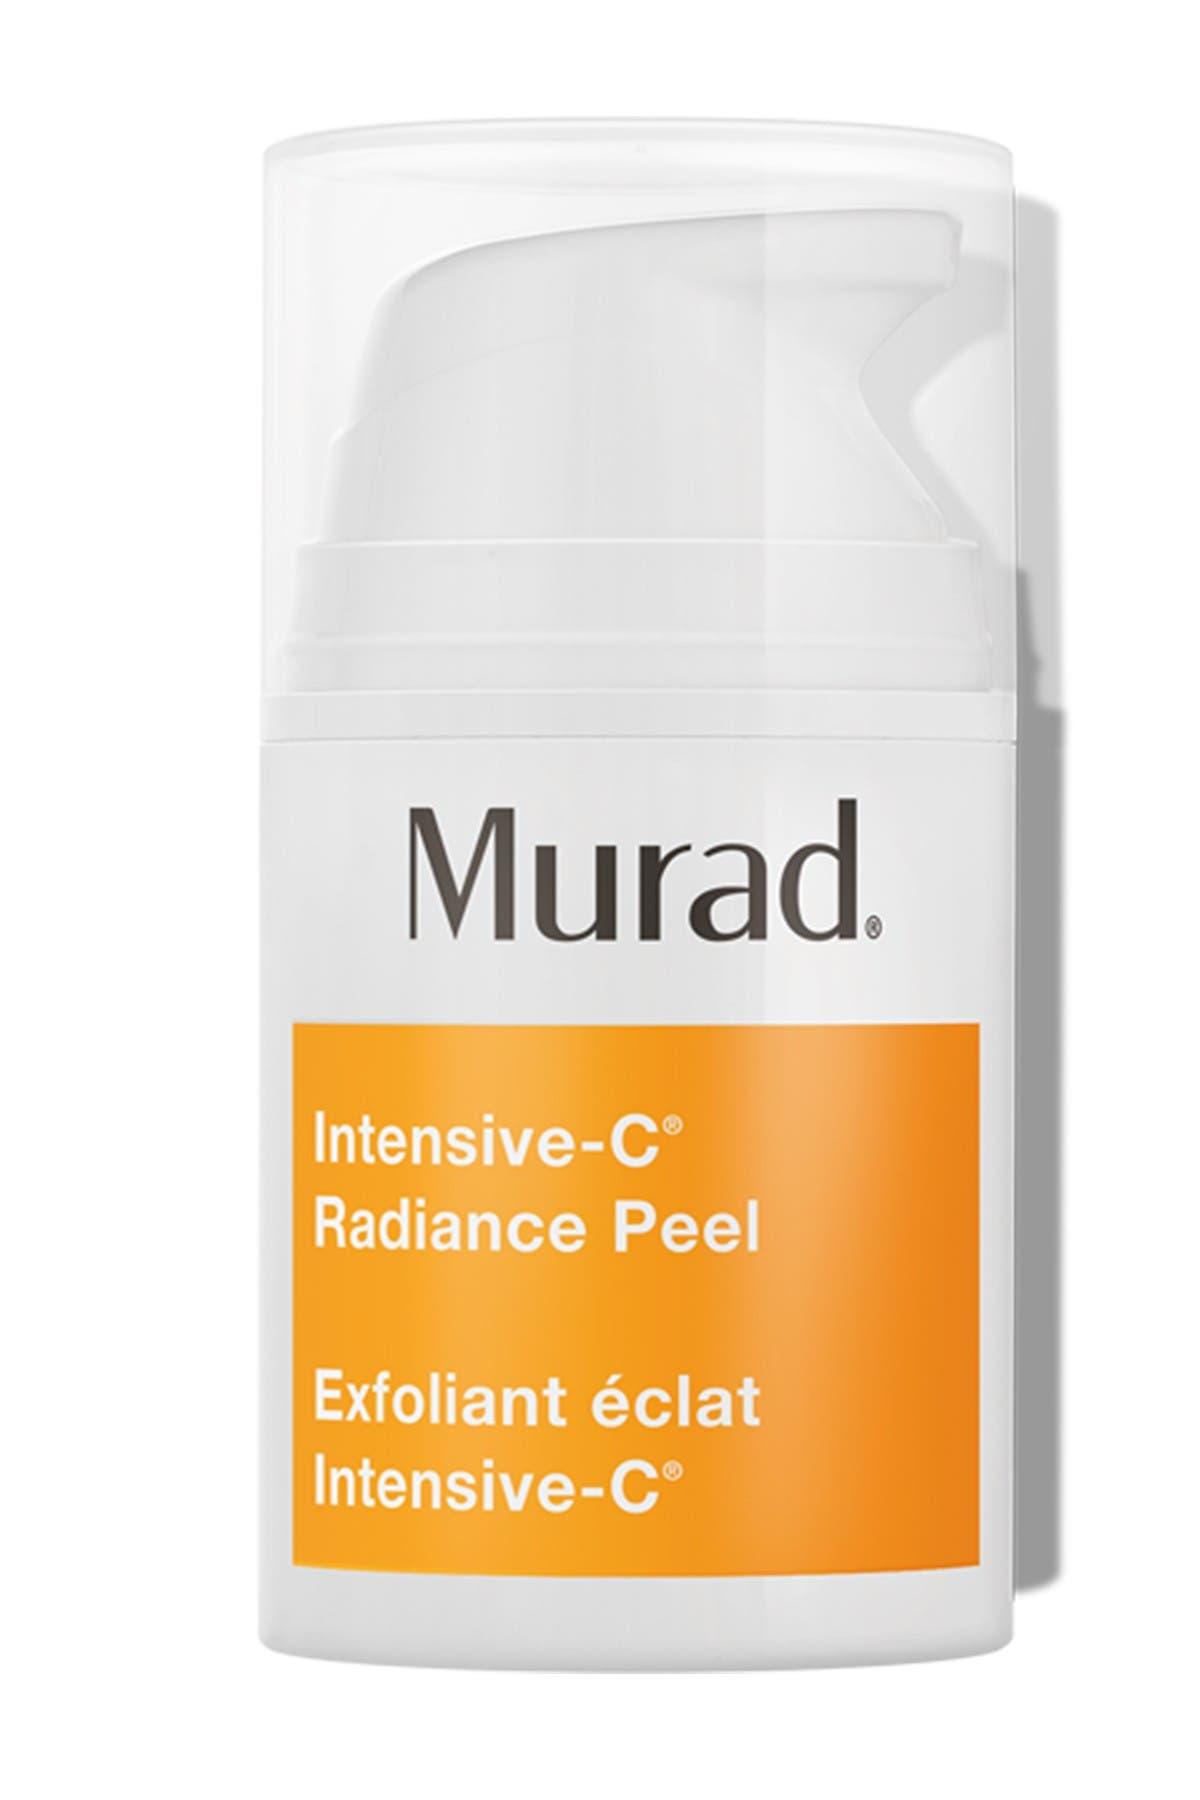 Image of Murad Intensive-C Radiance Peel